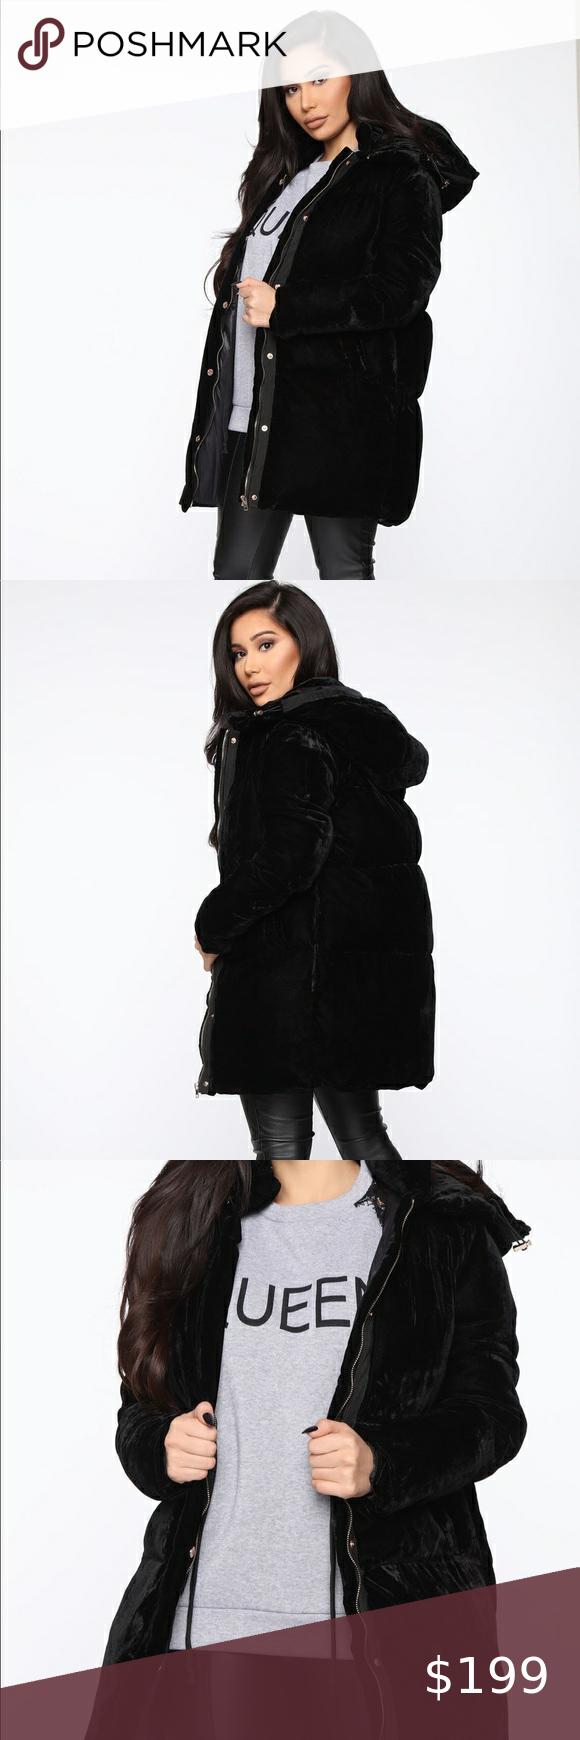 Velvet Puffer Chic Fashion Oversized Satisfaction Fashion Clothes Design Fashion Trends [ 1740 x 580 Pixel ]